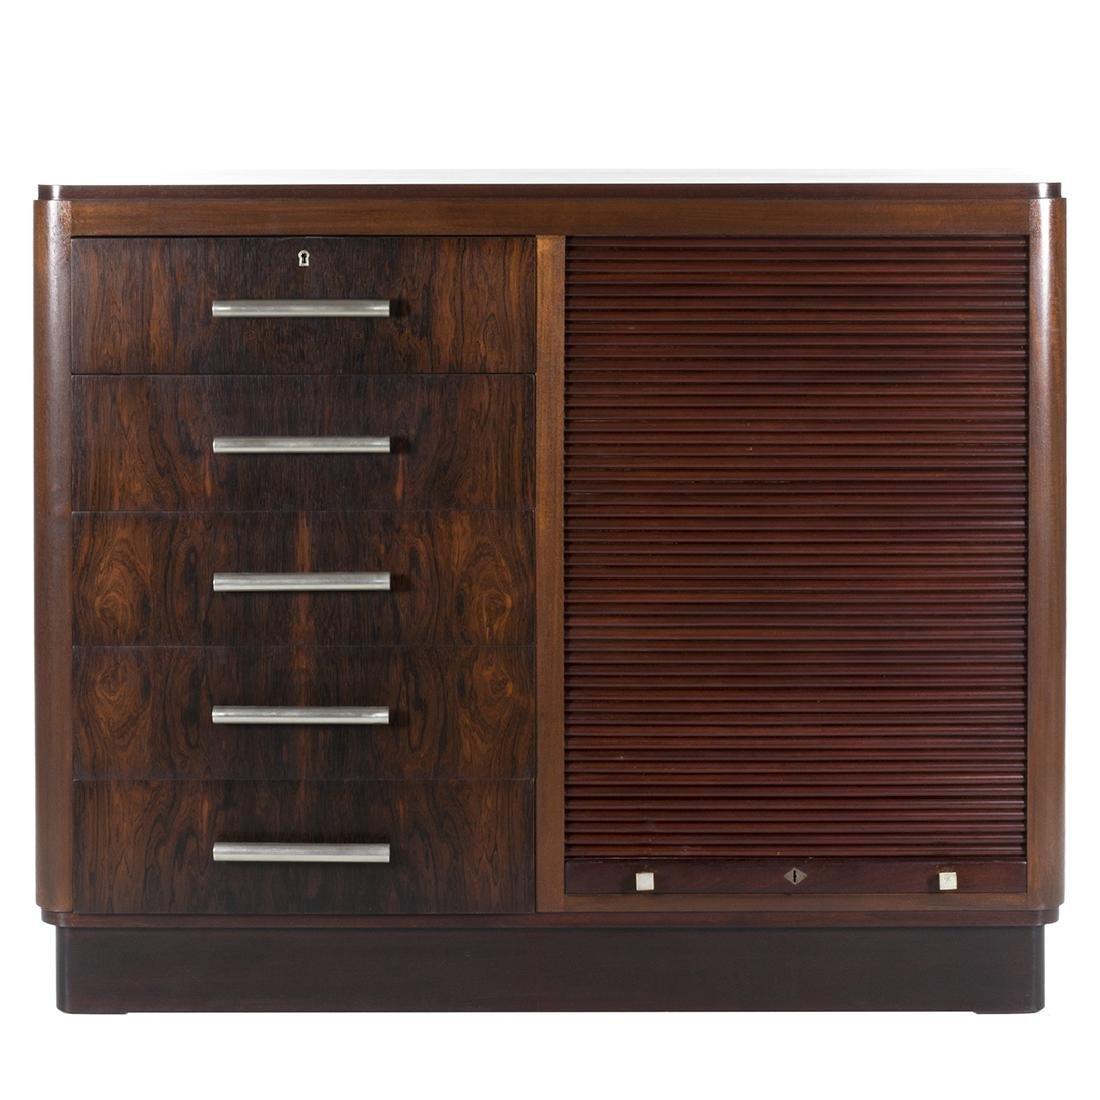 Rosewood Art Deco Cabinet - 2